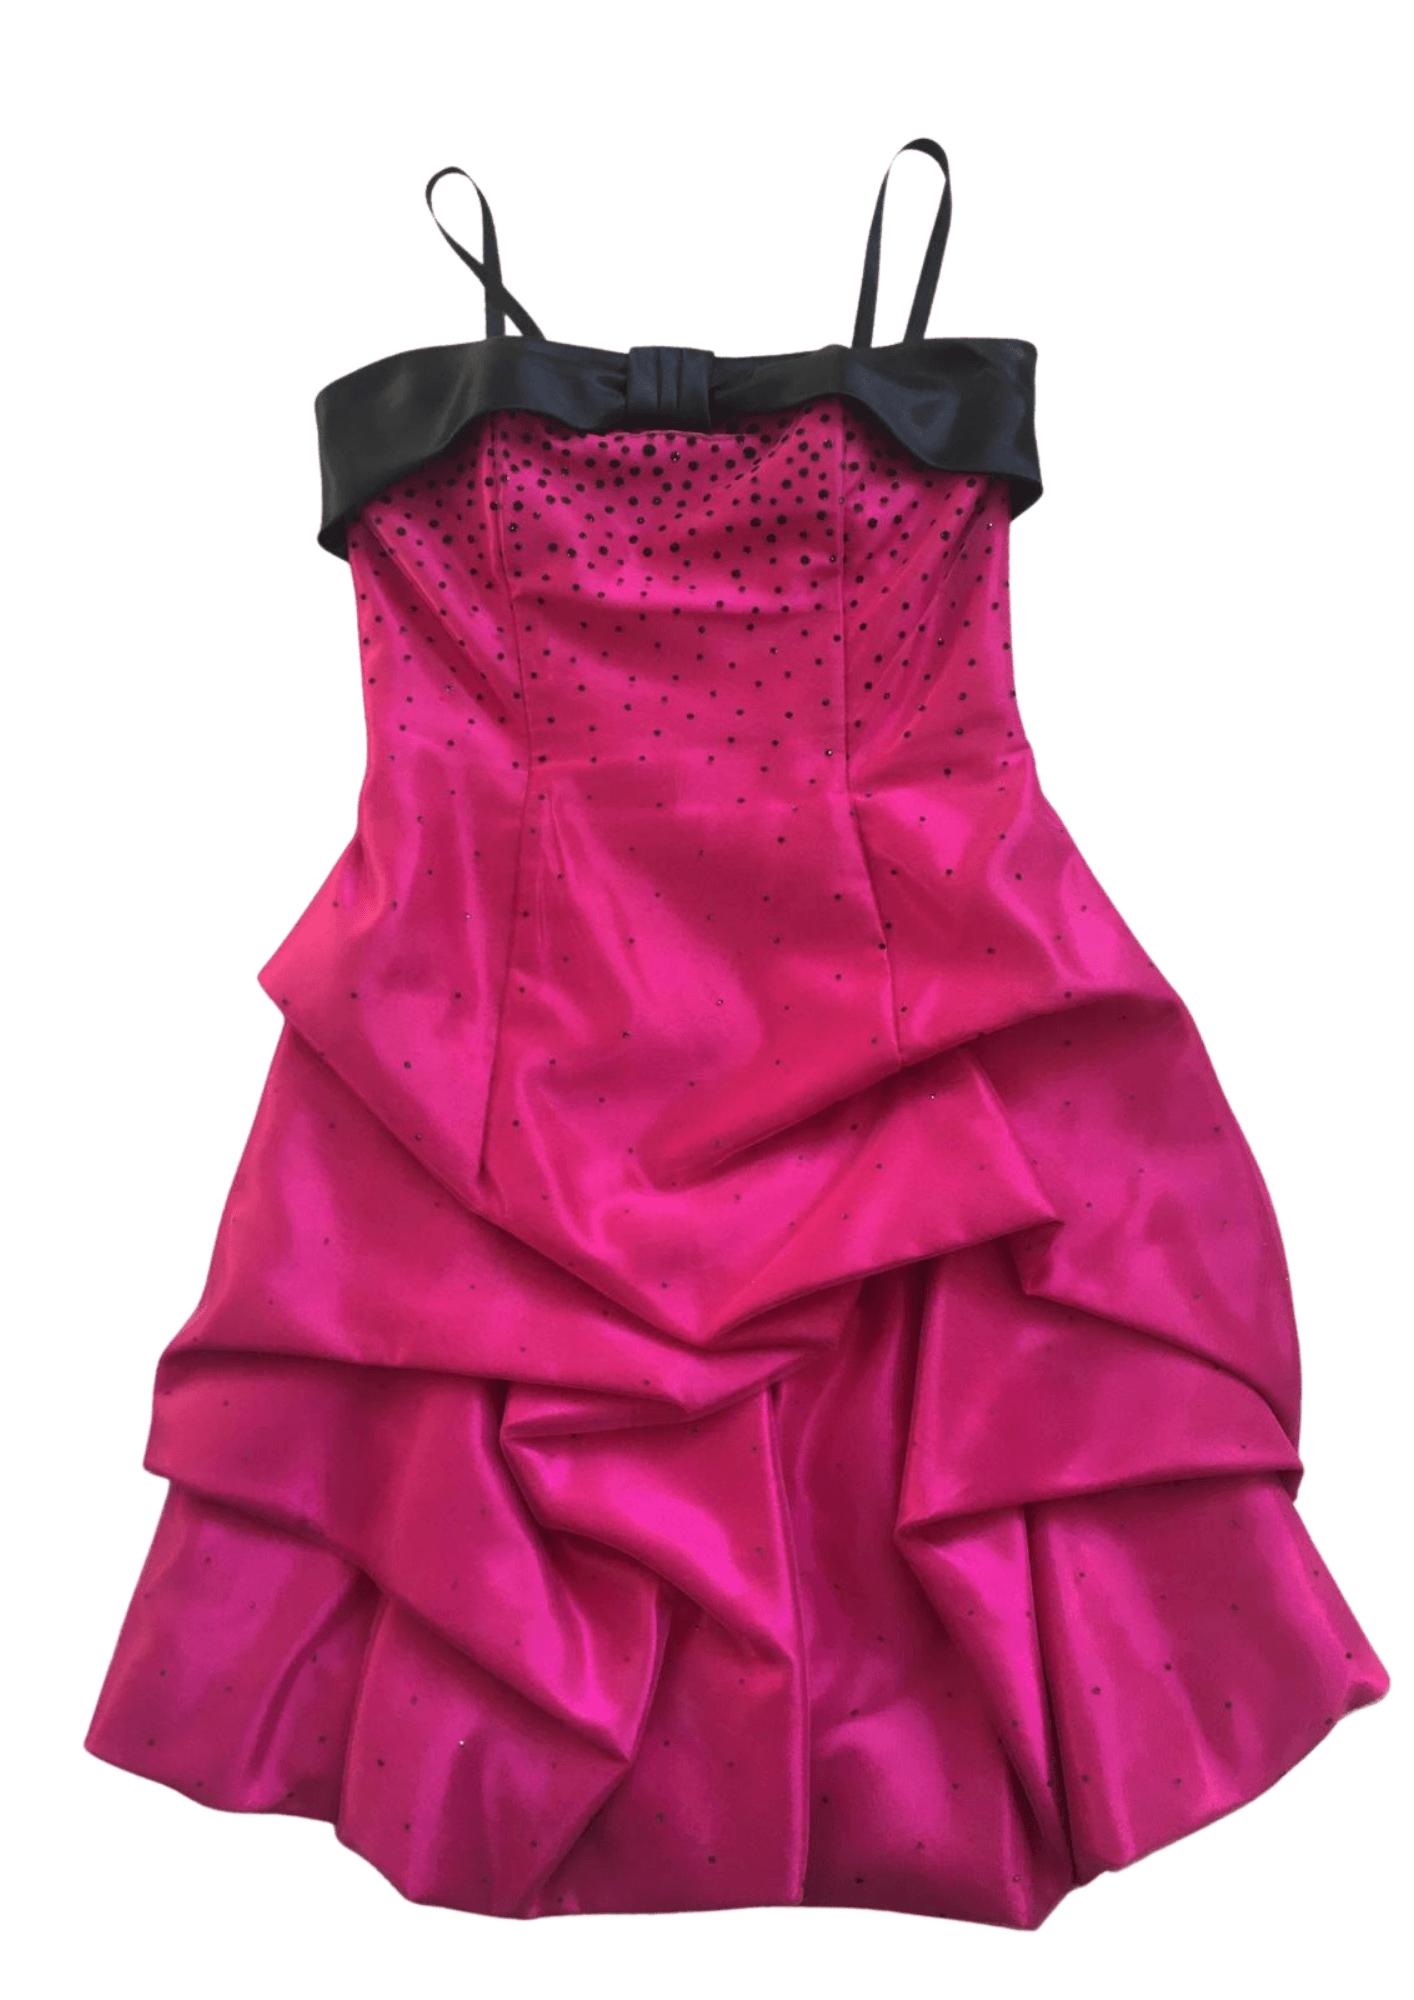 Pre-Loved Jessica McClintock Dress – Age 12-14 Kind Shop